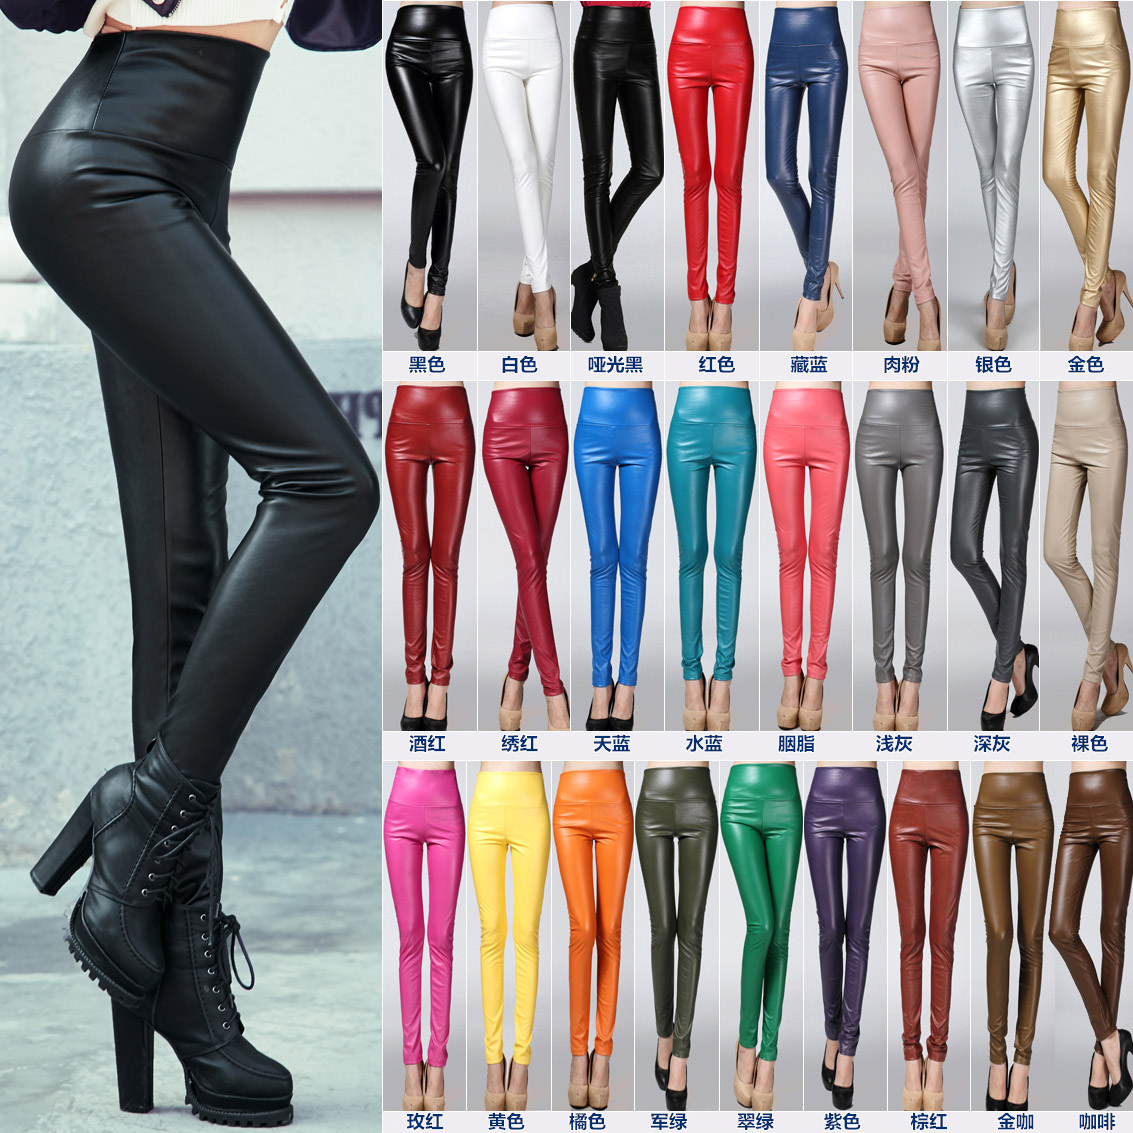 2017 Autumn Winter Women Elastic PU Leather Velvet High Waist Thick Warm leggings Slim Pencil Pants Colorful Trousers Female